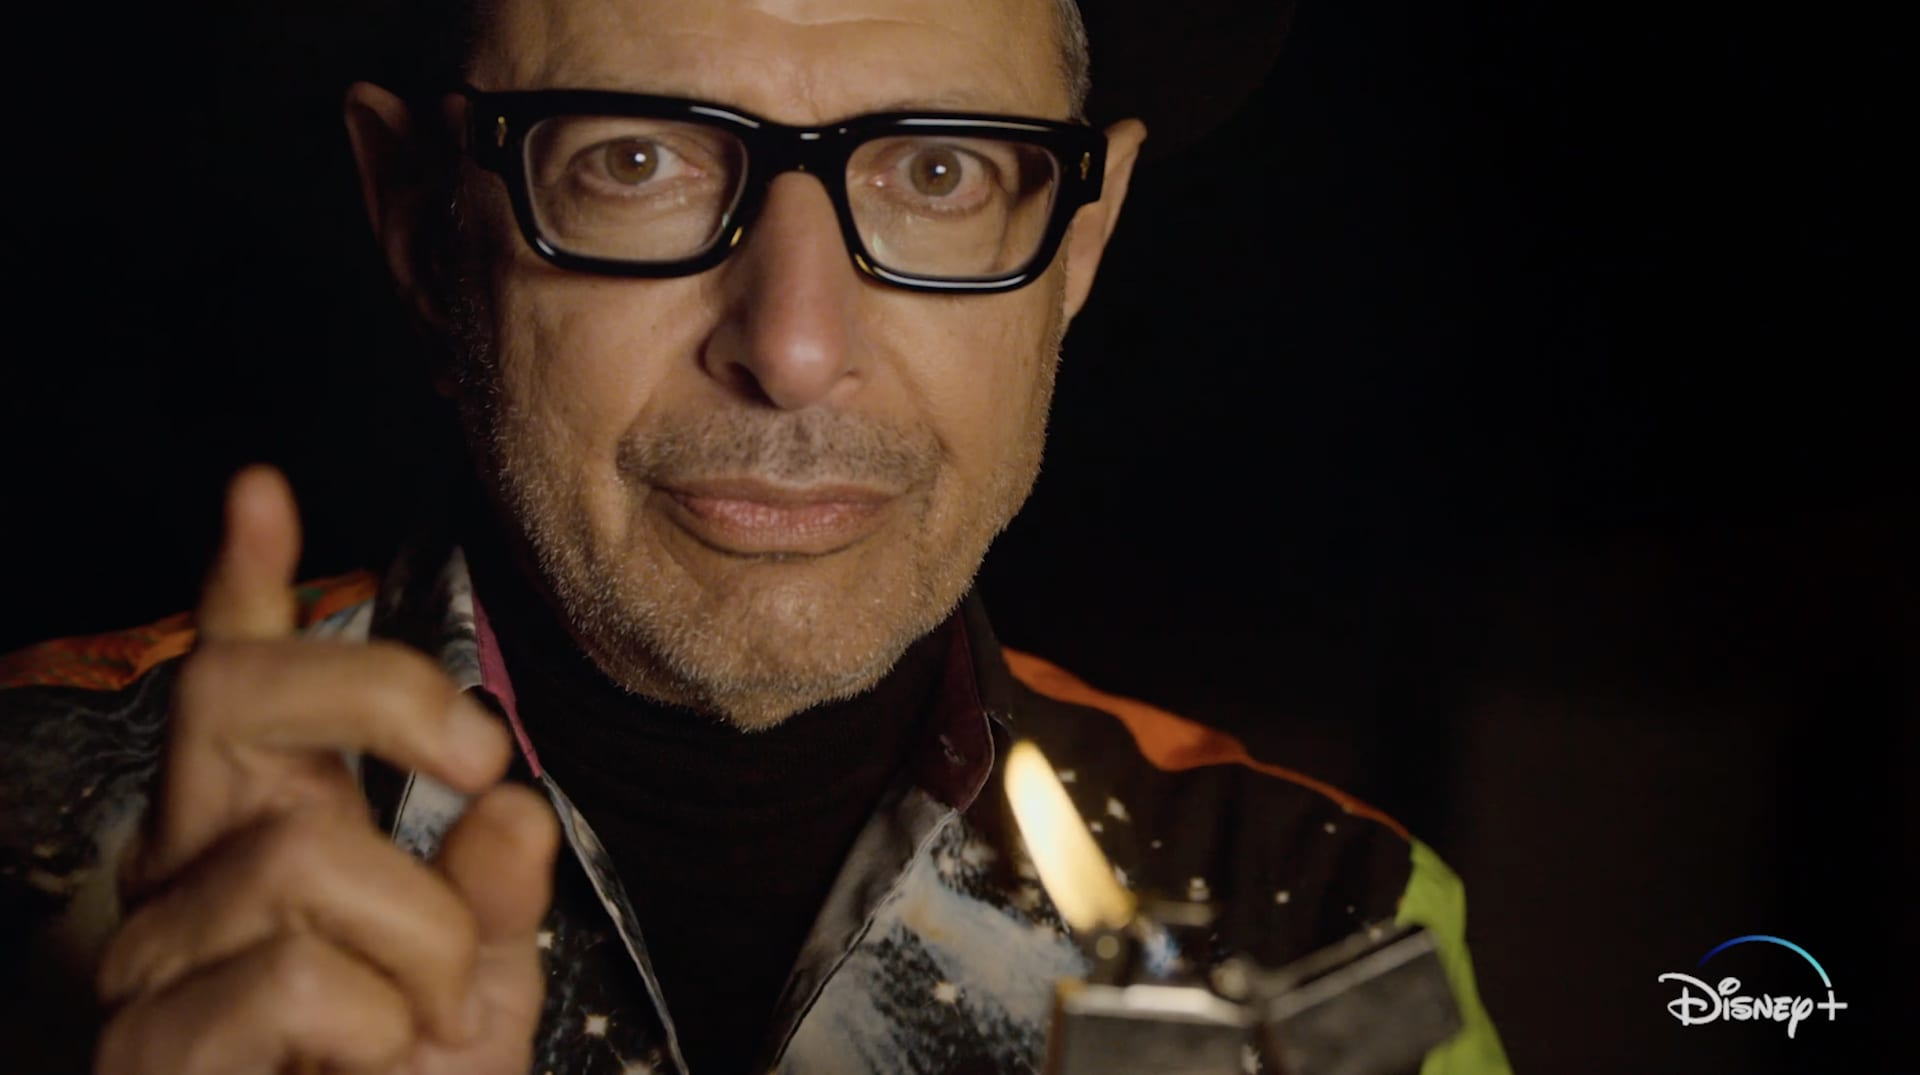 Happy 4th of July | The World According to Jeff Goldblum | Disney+